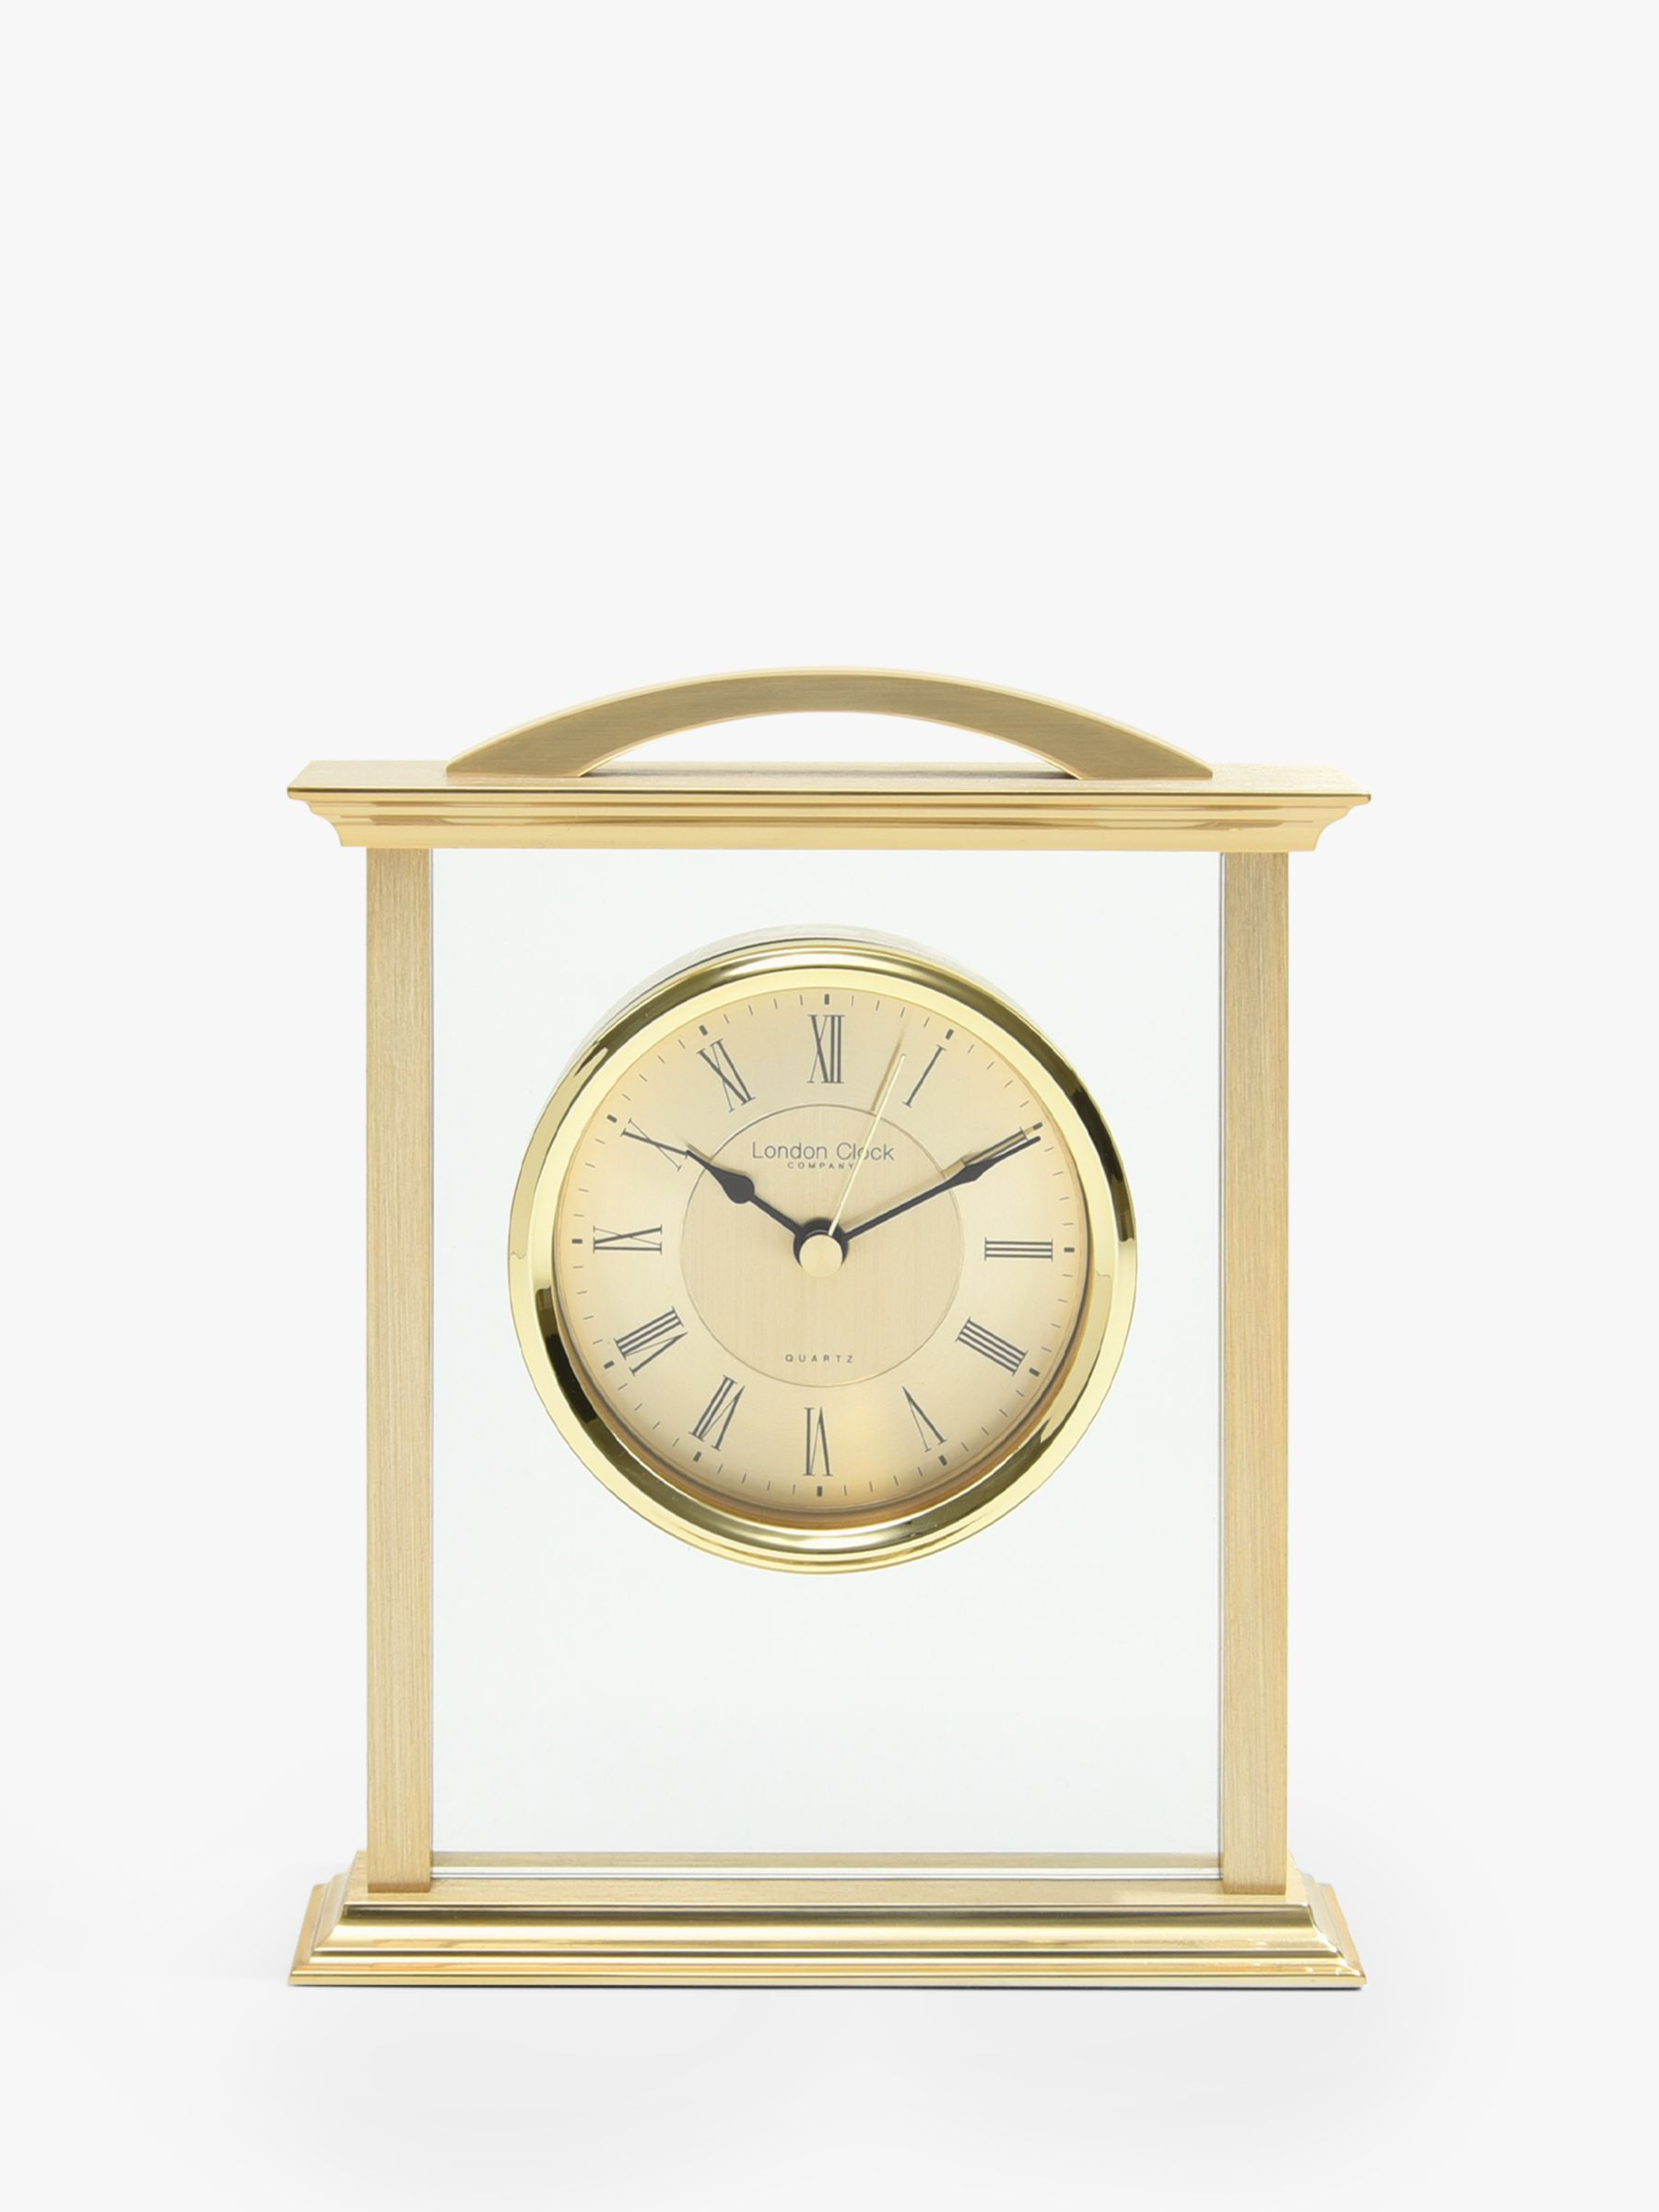 London Clock Company Roman Numeral Analogue Mantel Clock, Brass